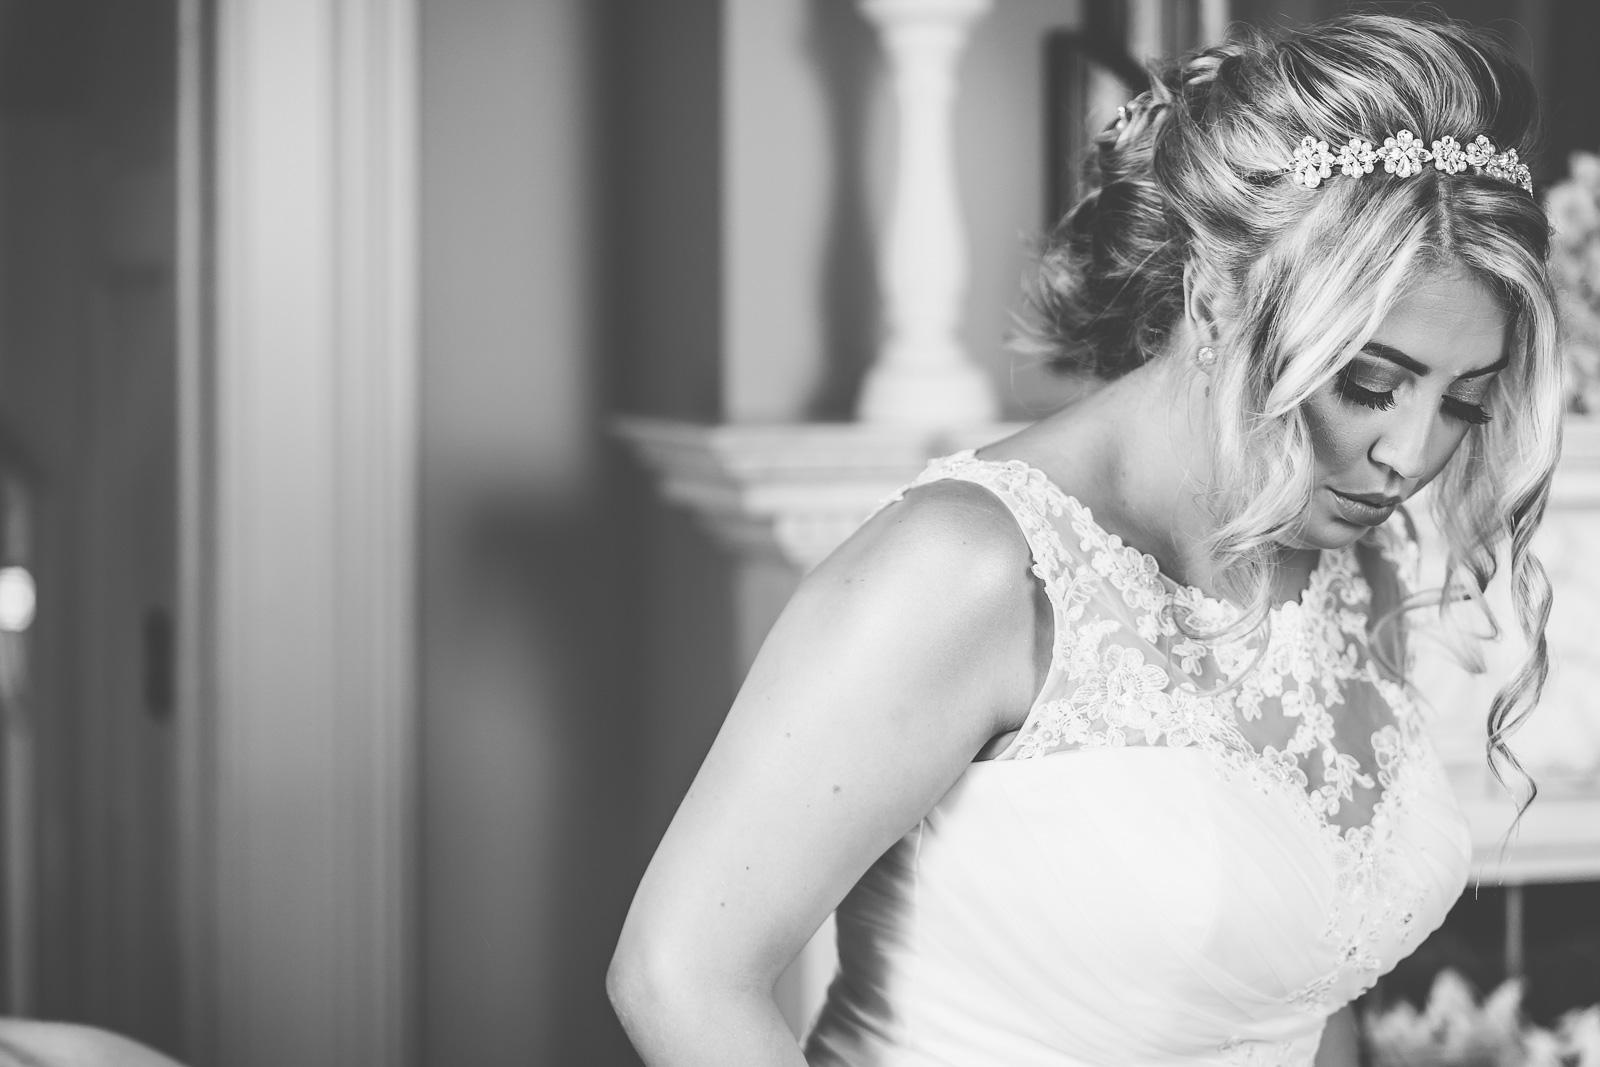 cornhill_castle_wedding_biggar_dearlyphotography (43 of 448).jpg